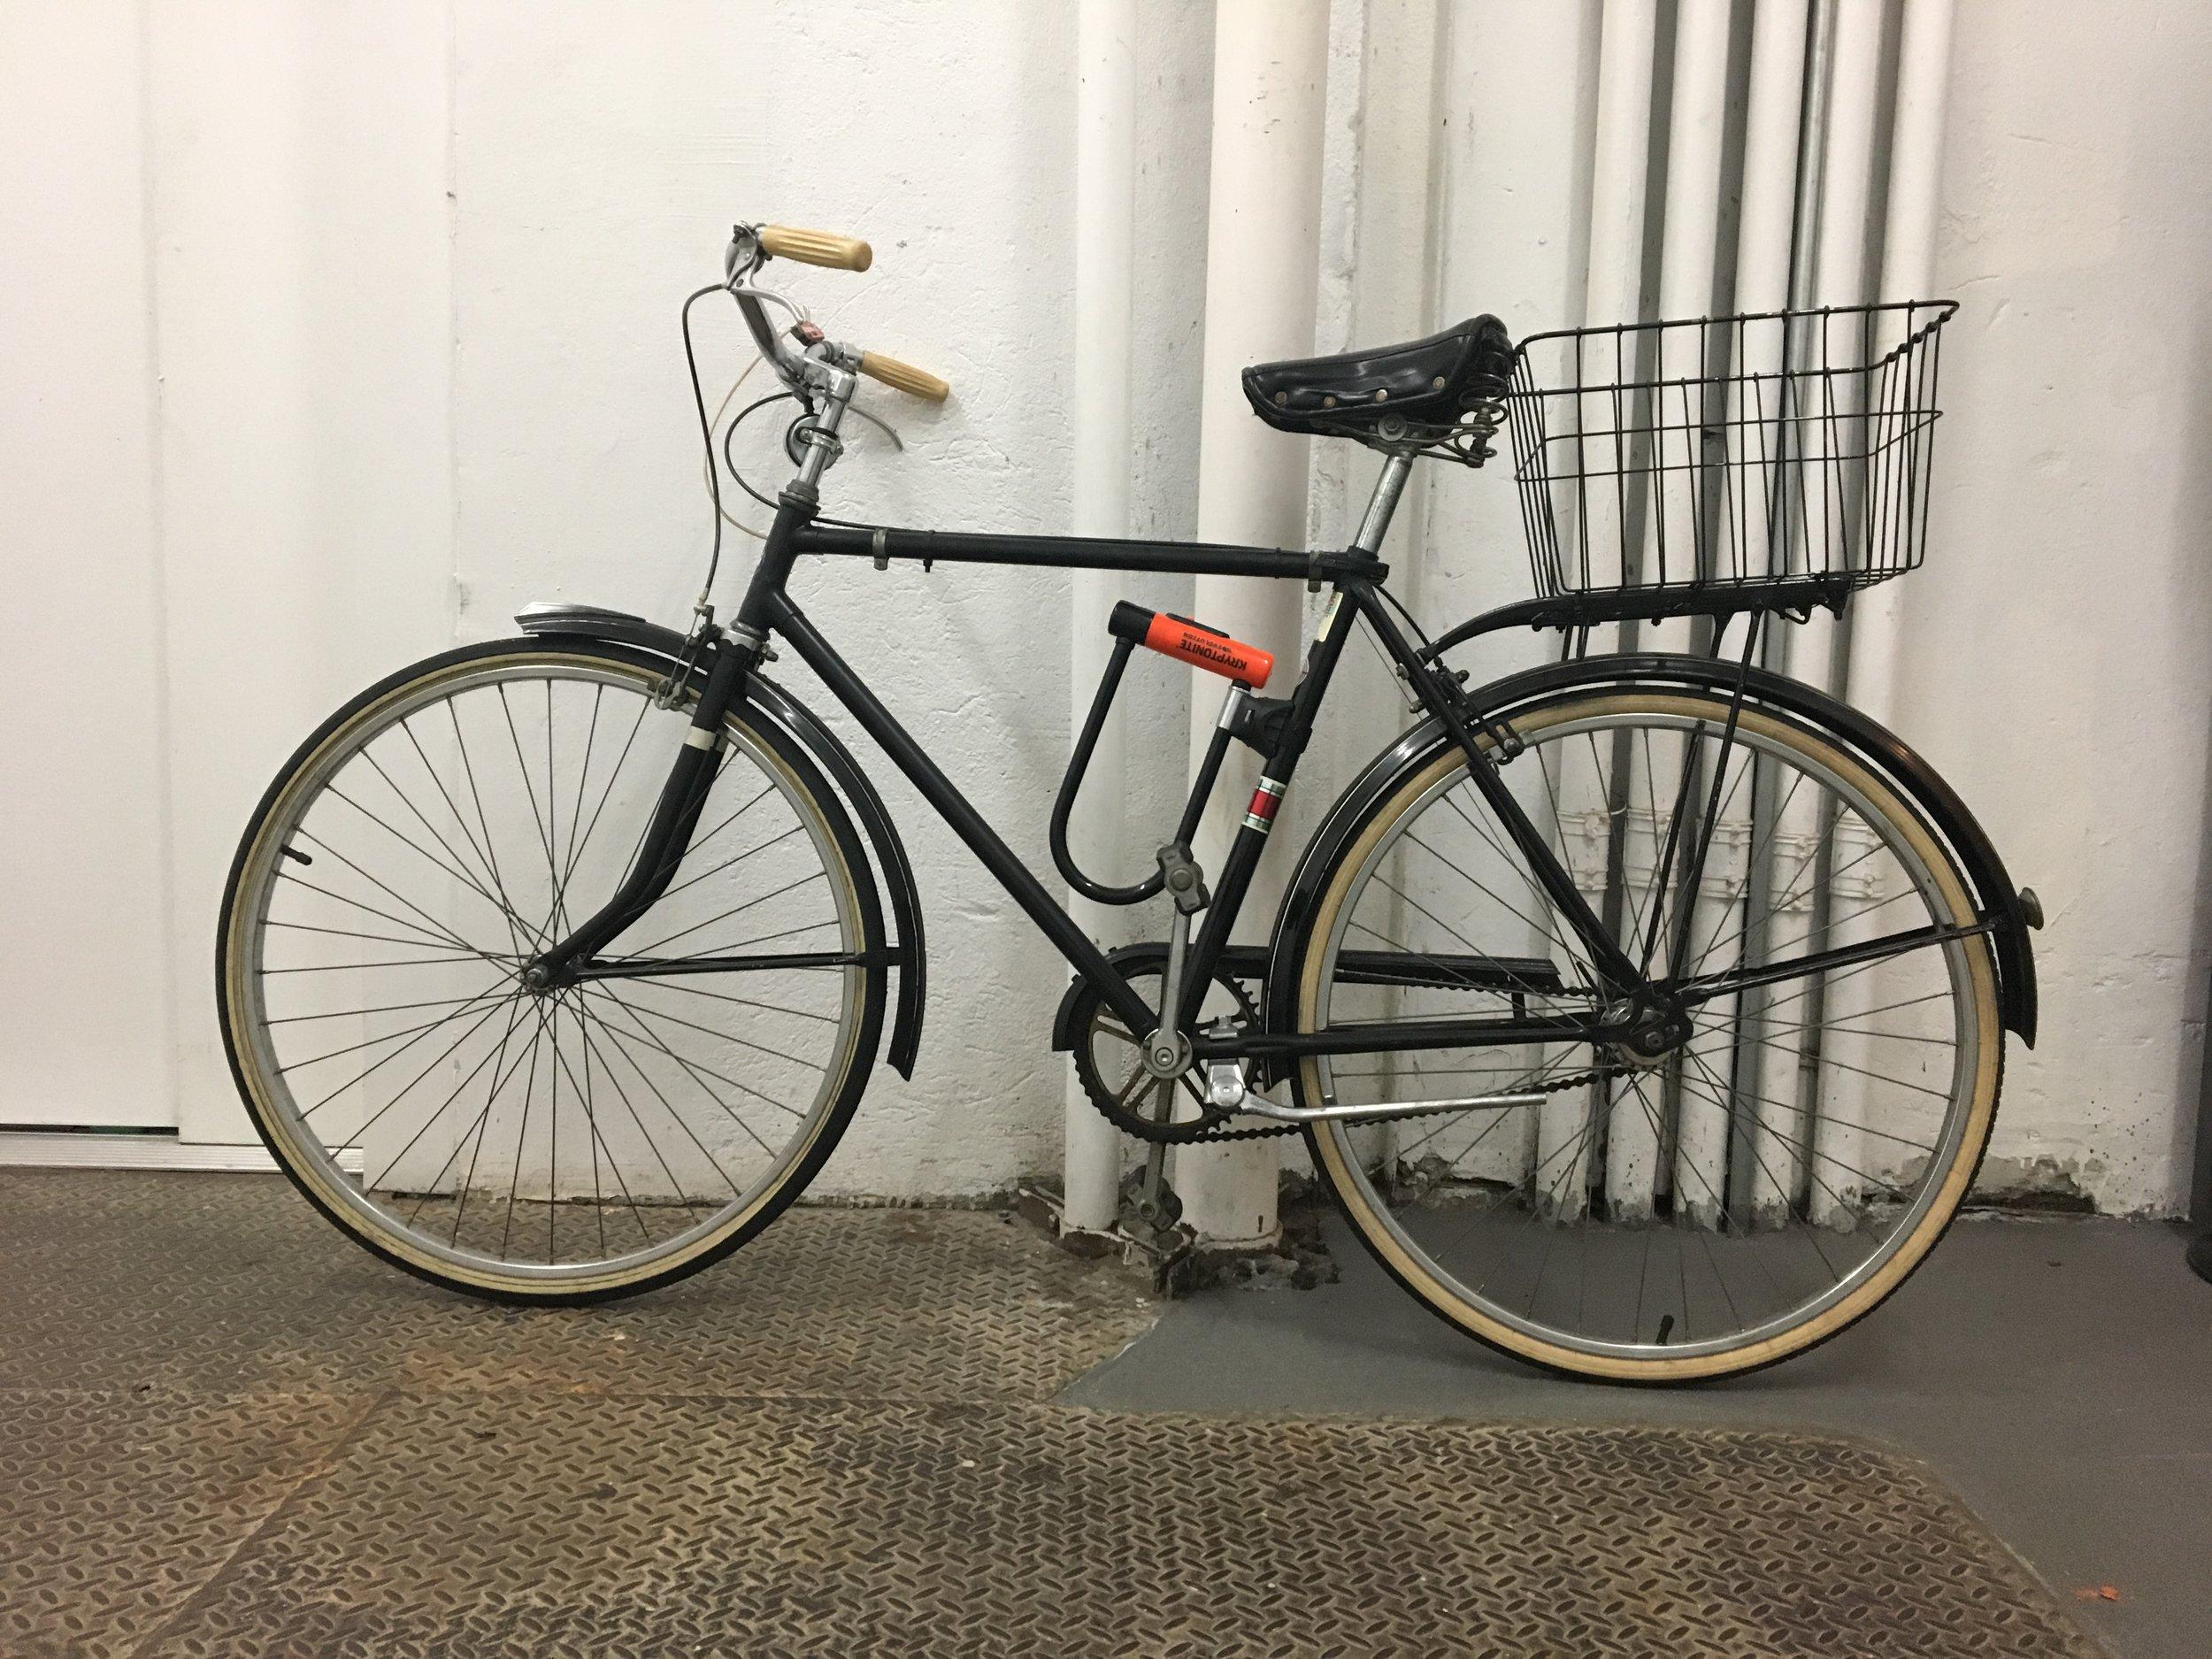 Bika's bike